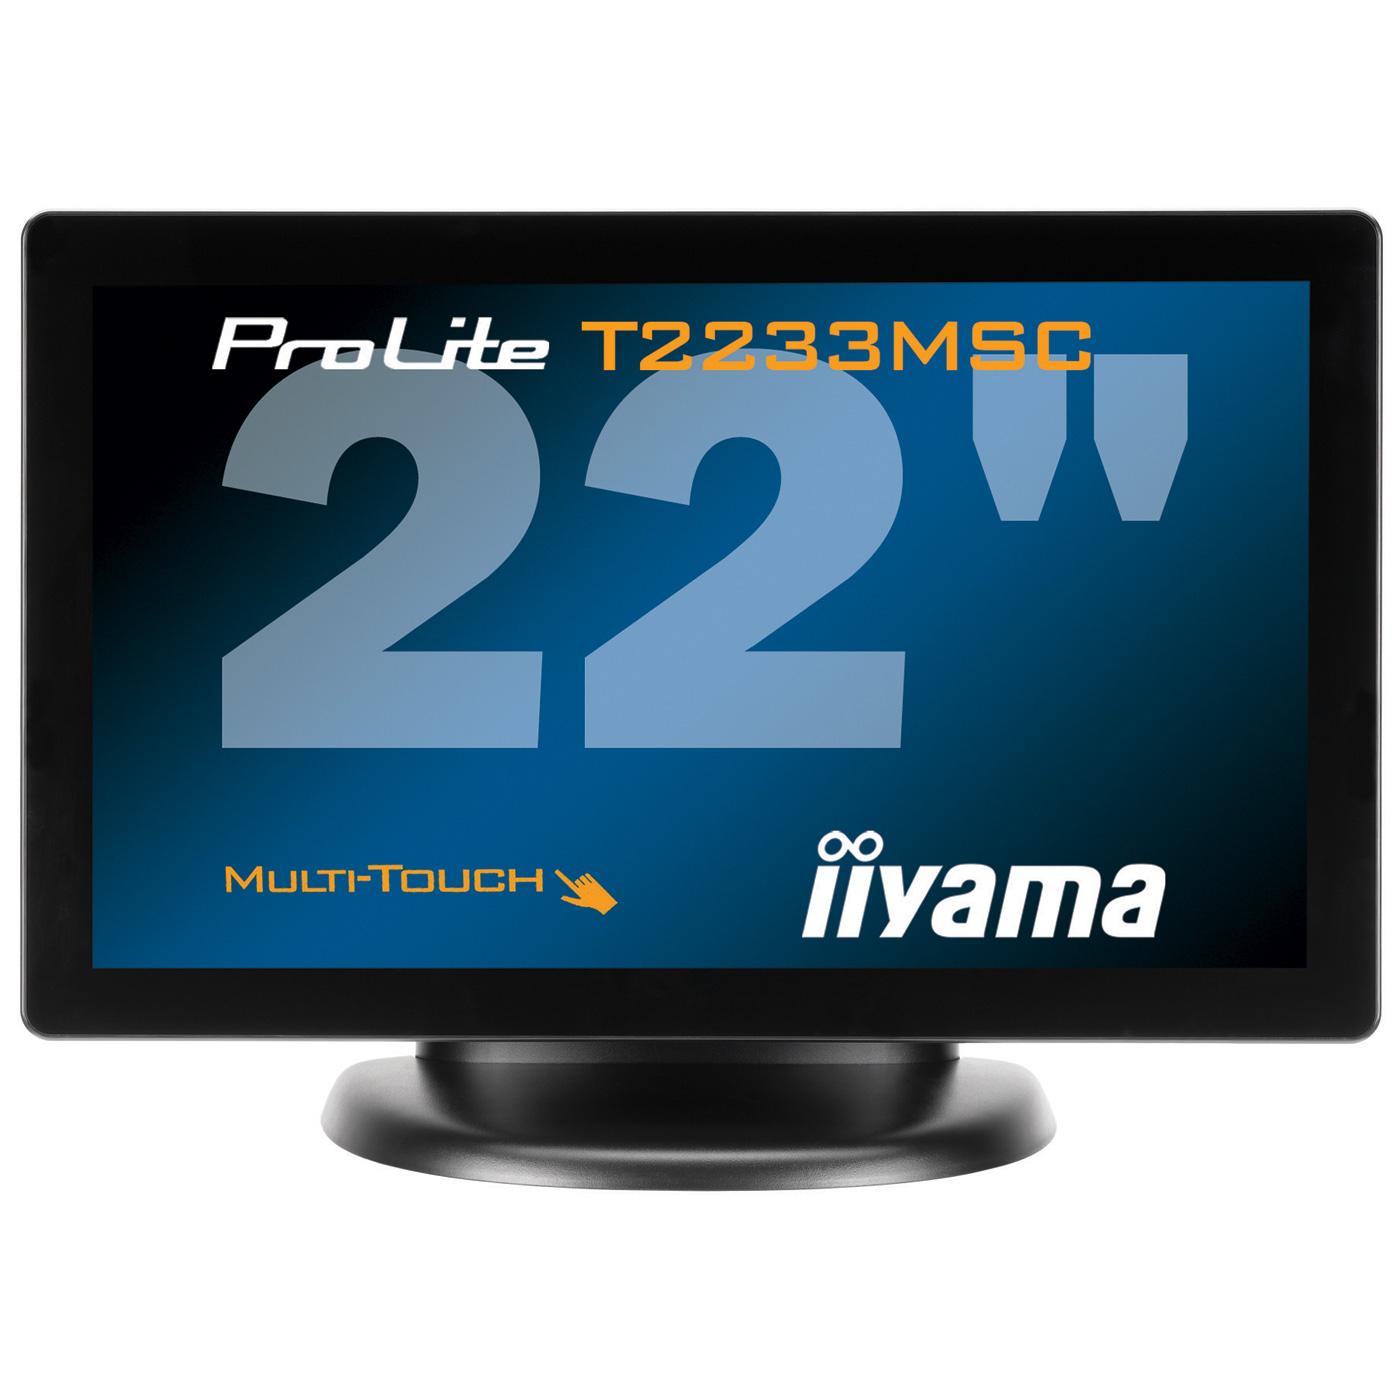 "Ecran PC iiyama 21.5"" LCD Tactile - ProLite T2233MSC-1 1920 x 1080 pixels - Tactile Multi-Touch - 5 ms - Format large 16/9 - Noir"